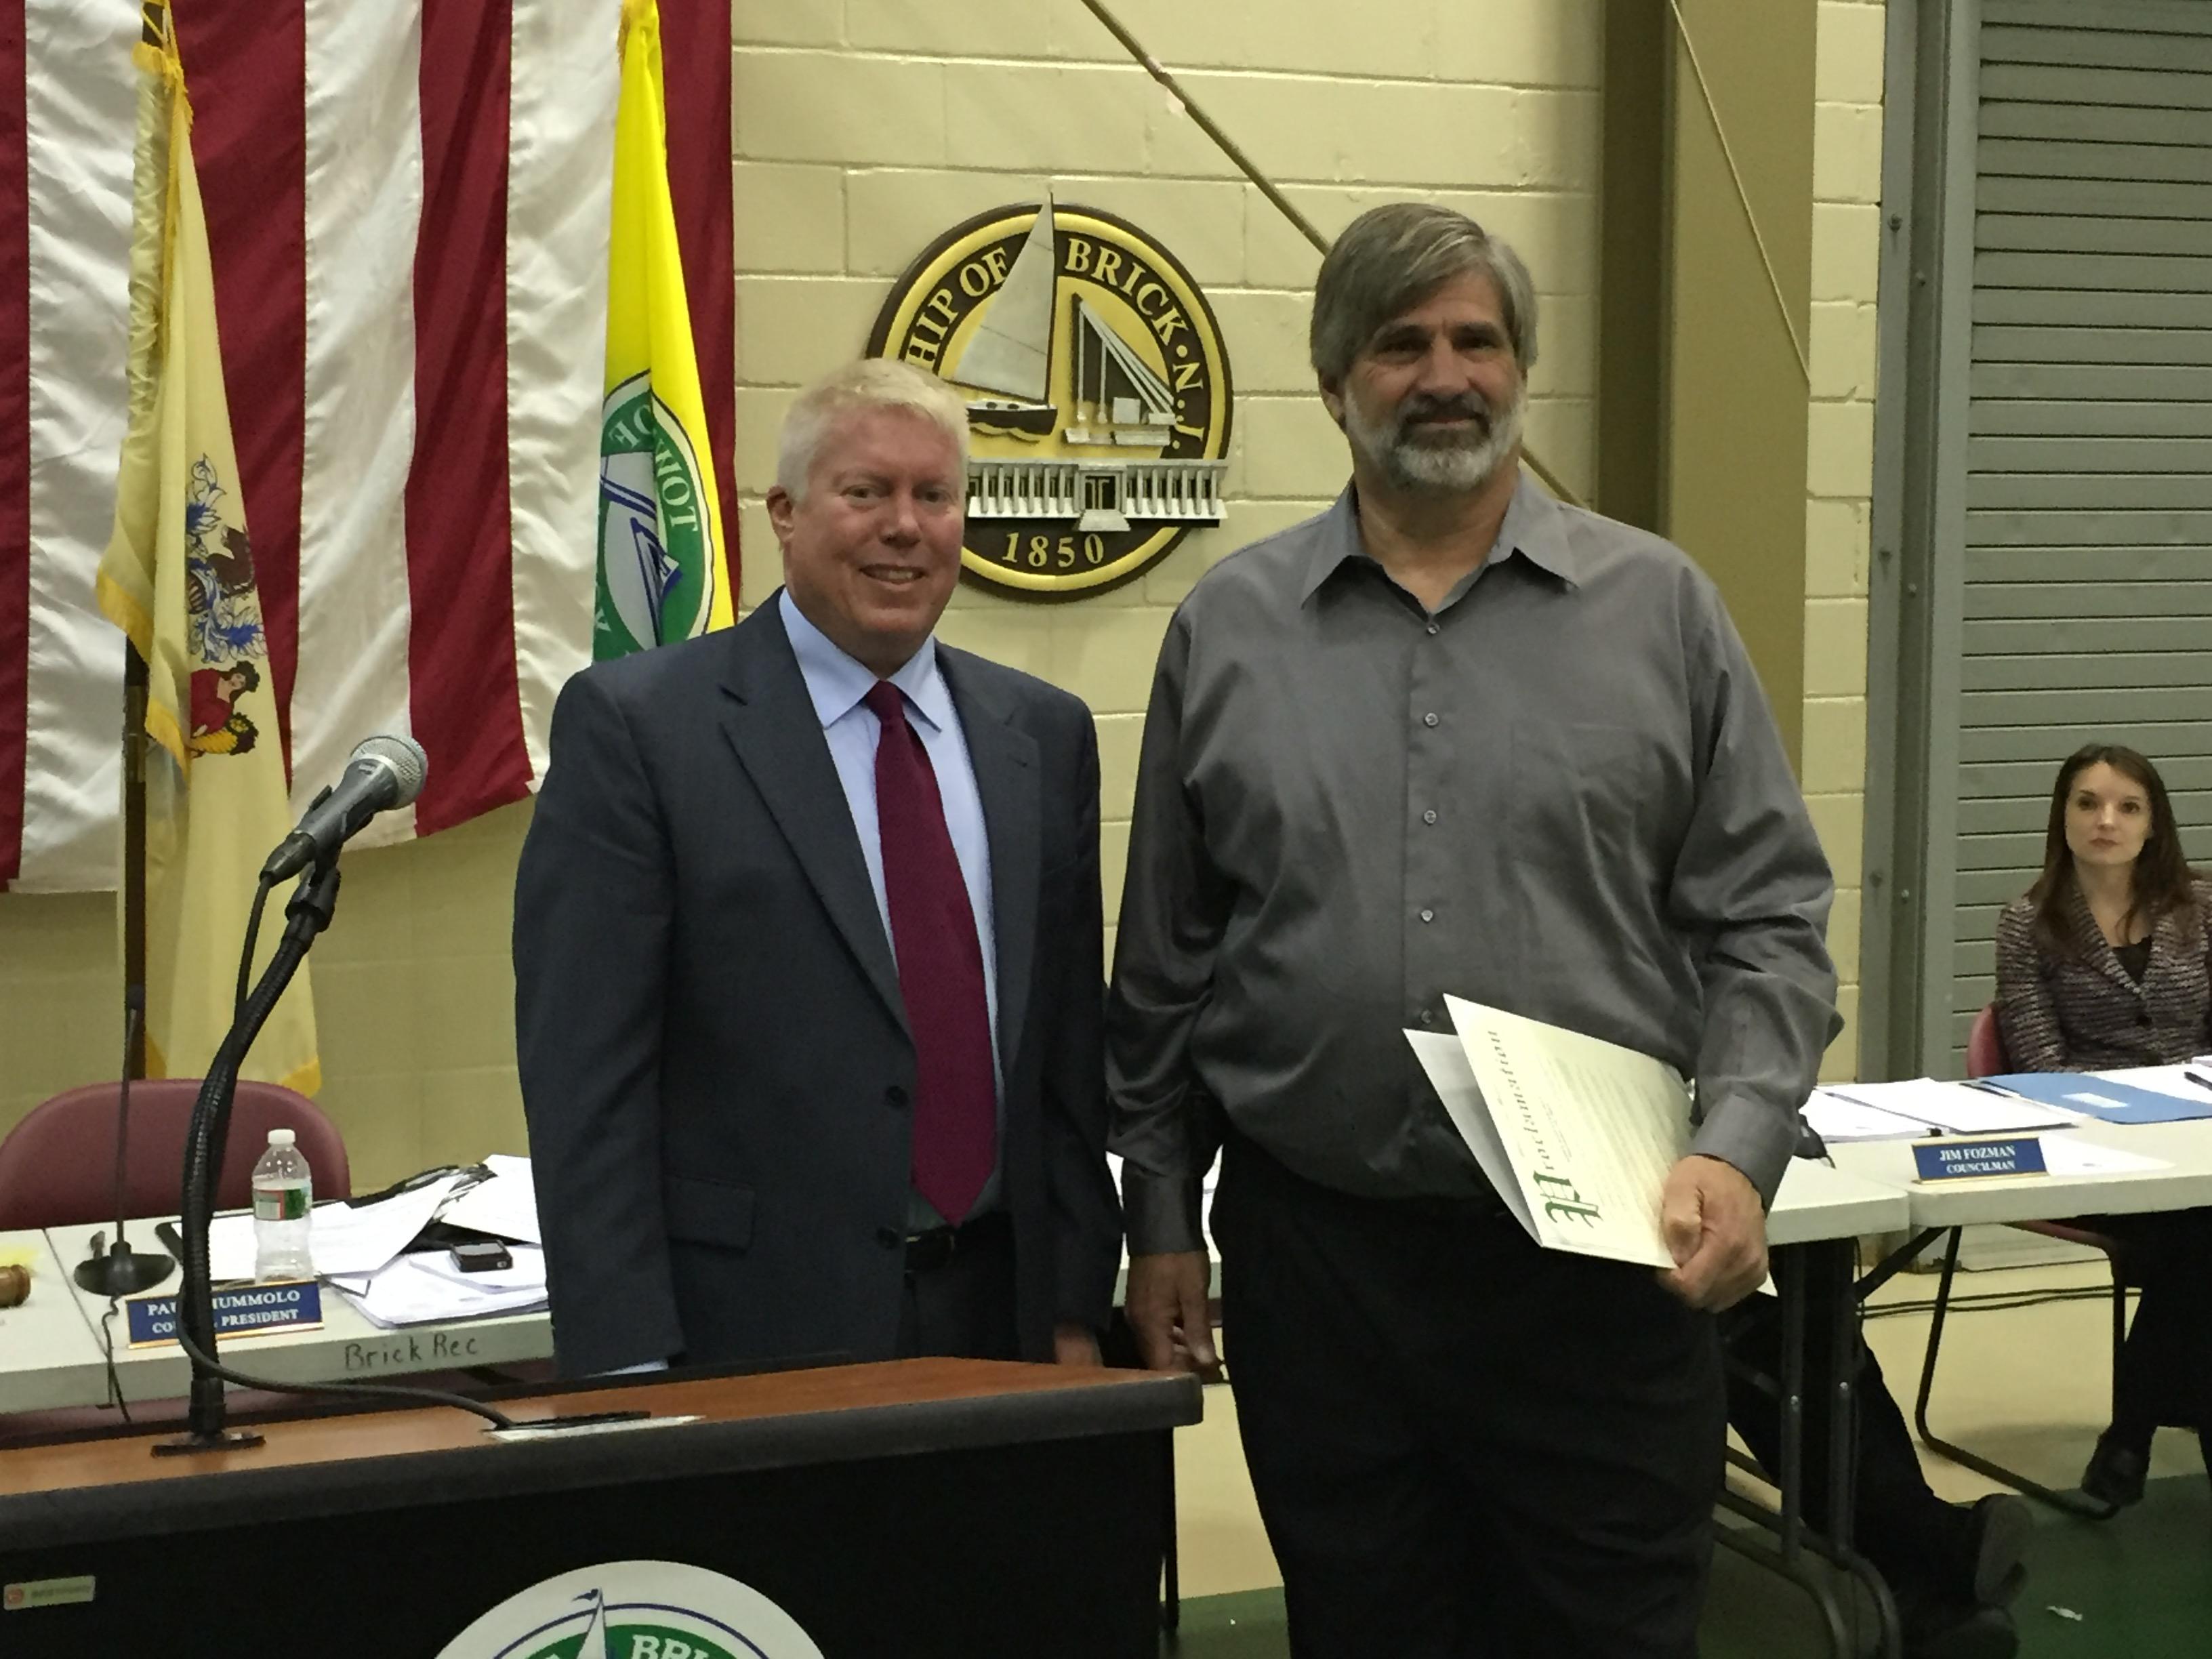 John Koester receives recognition from Mayor John Ducey. (Photo: Daniel Nee)